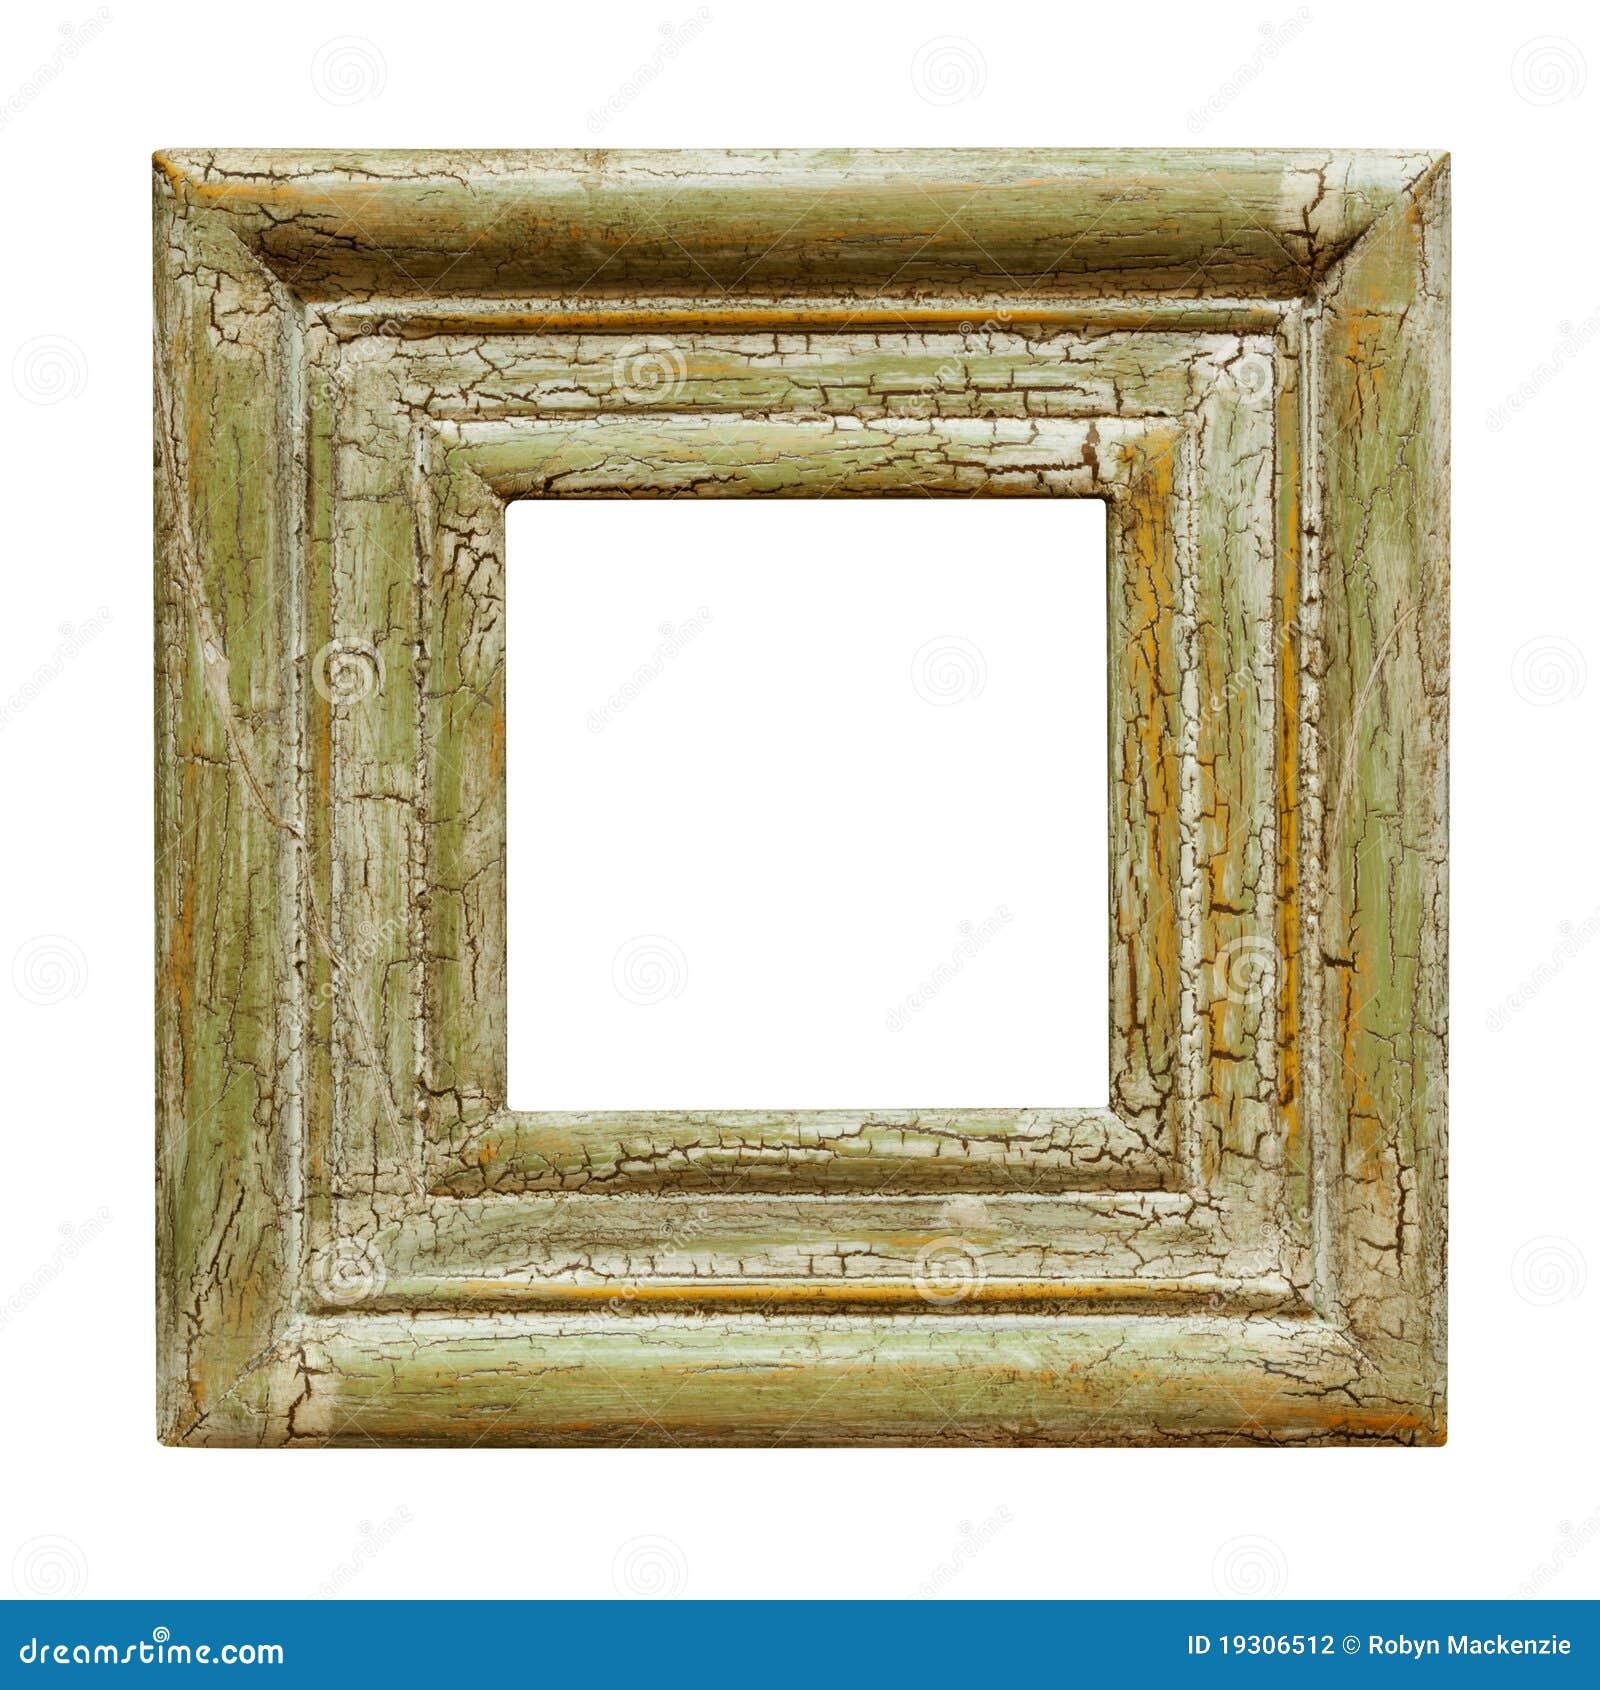 cadre de tableau carr afflig photo stock image du texture criqu 19306512. Black Bedroom Furniture Sets. Home Design Ideas